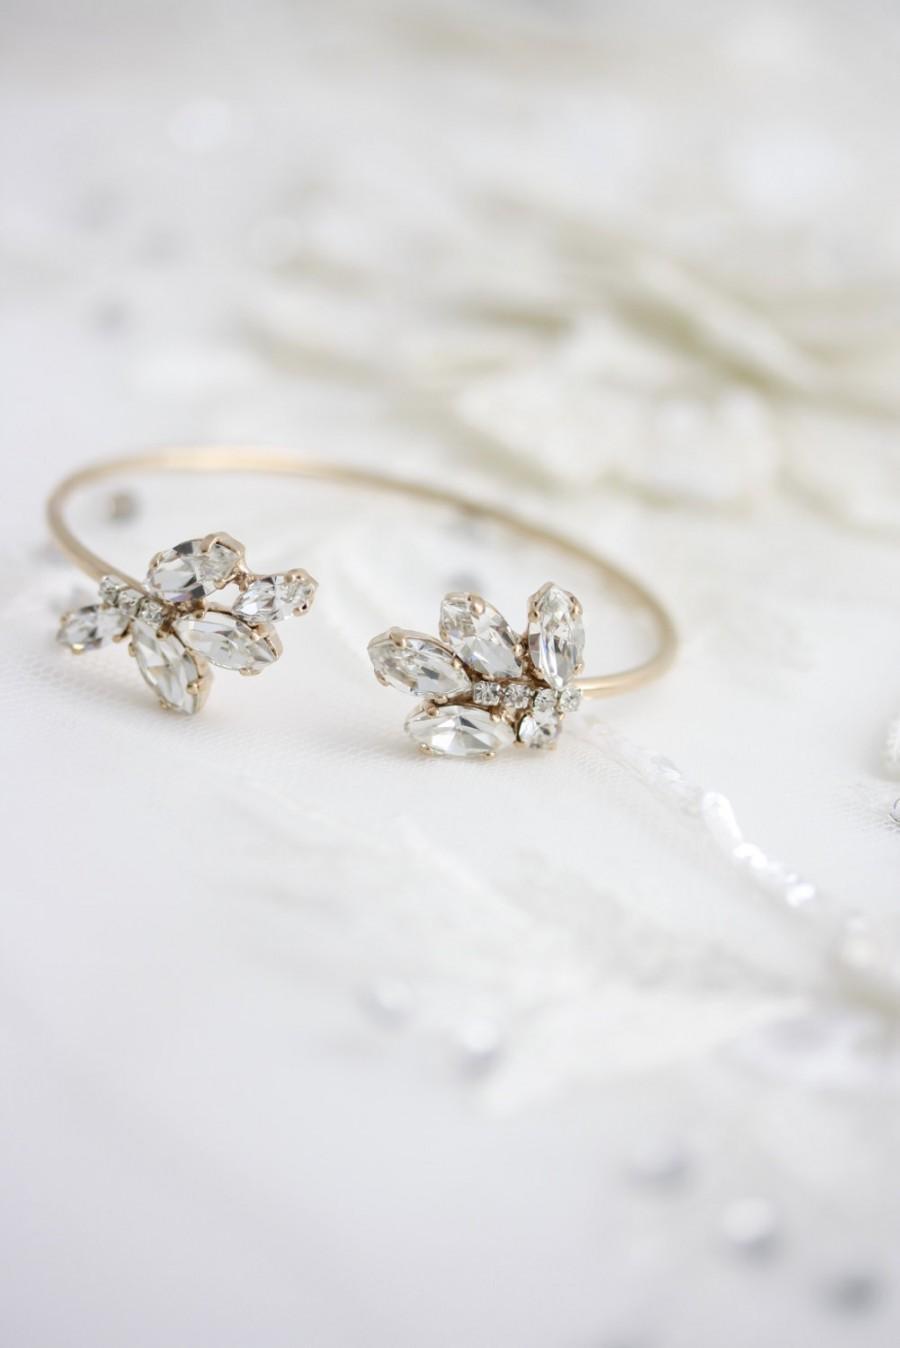 Hochzeit - Bridal Wedding Bracelet Crystal Cuff Bracelet Open Cuff Bracelet Swarovski Crystal Bridesmaids Jewelry Rose Gold Crystal Bracelet SOPHIE